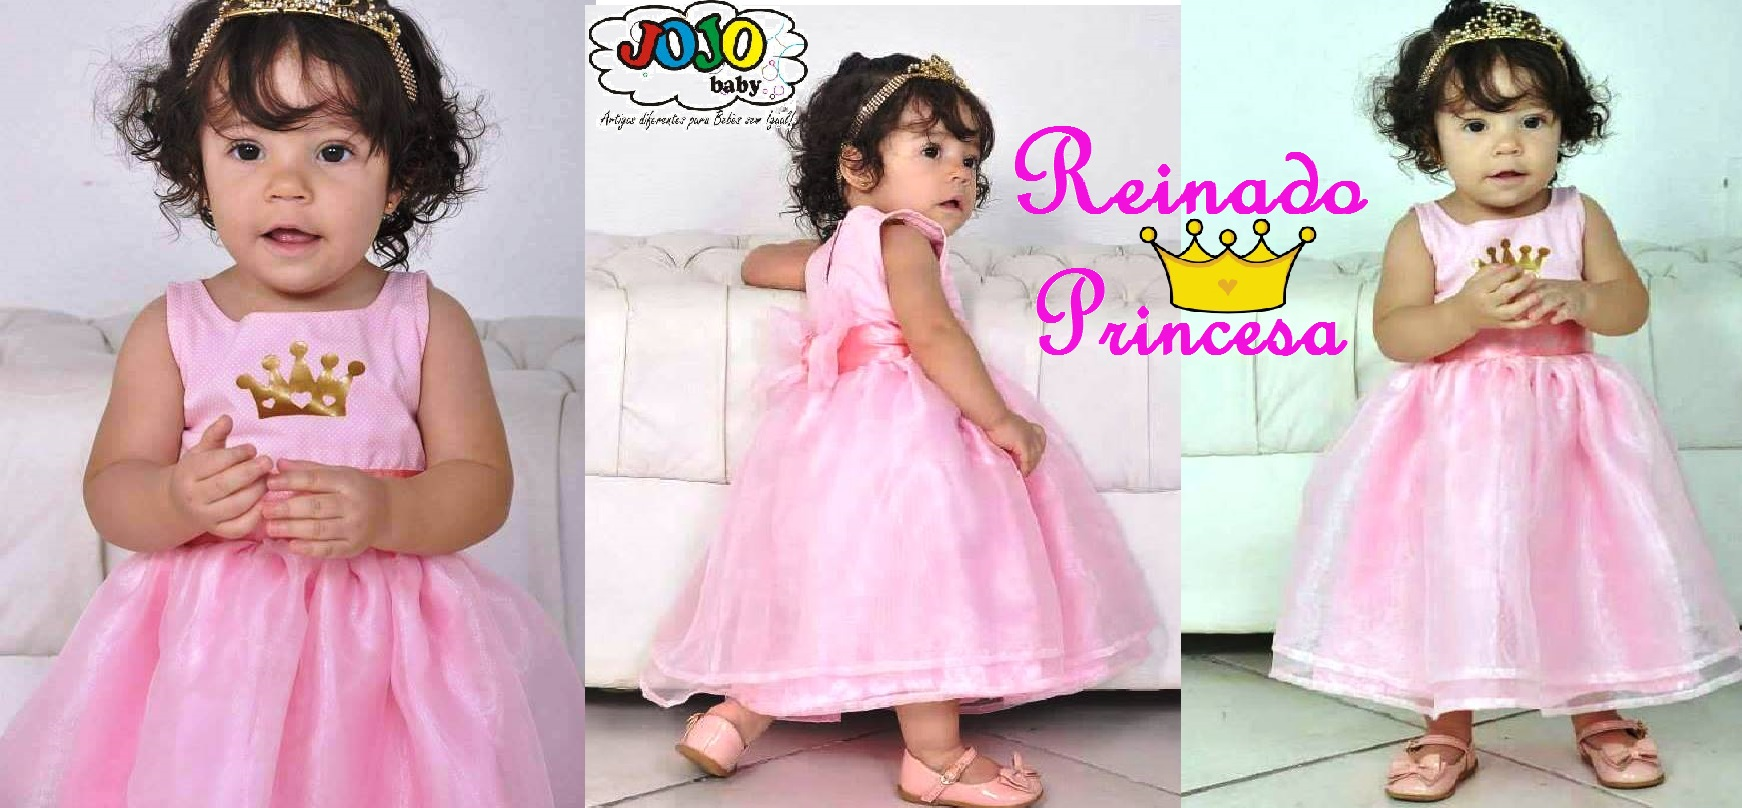 659d9da9fa JOJO Baby- Vestido Luxo Princesa Reinado no Elo7